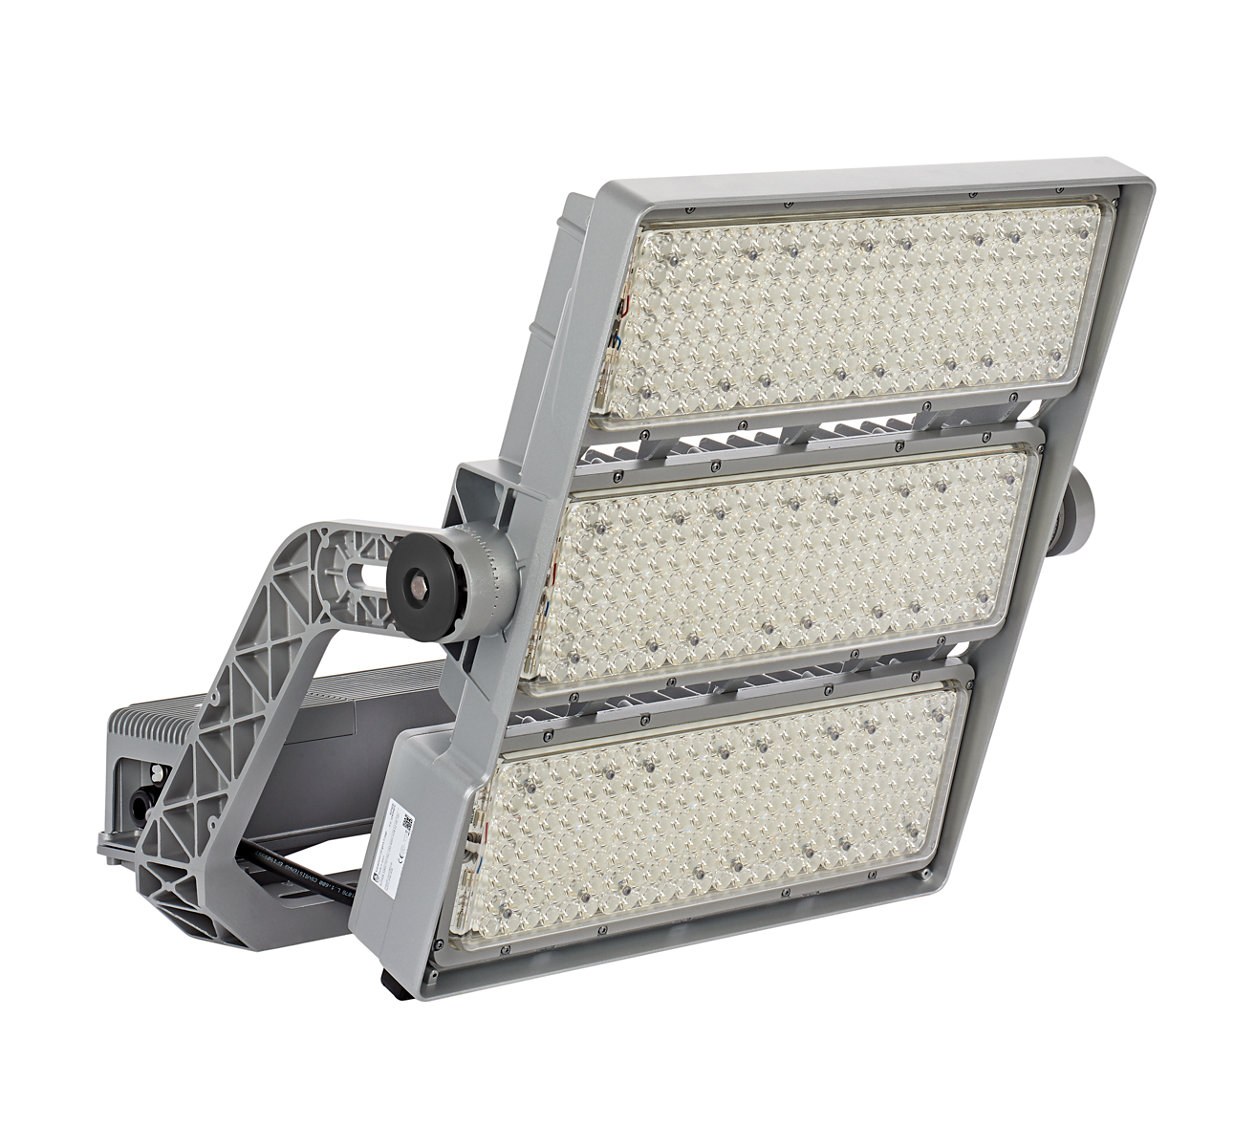 OptiVision LED gen3.5 – Έξυπνος φωτισμός υπαίθριων και αθλητικών χώρων ψυχαγωγίας